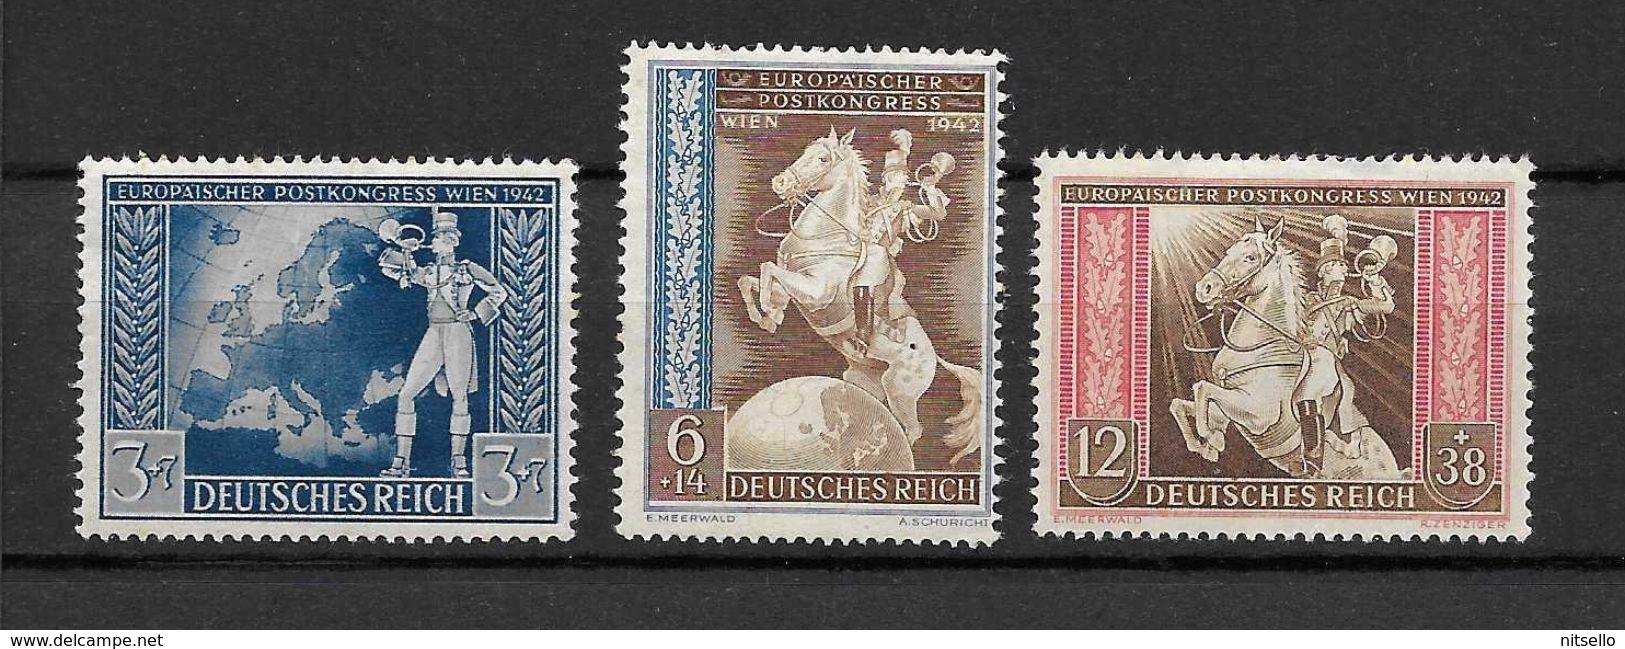 LOTE 1588  ///  ALEMANIA IMPERIO    YVERT Nº: 744/746 *MH - Alemania